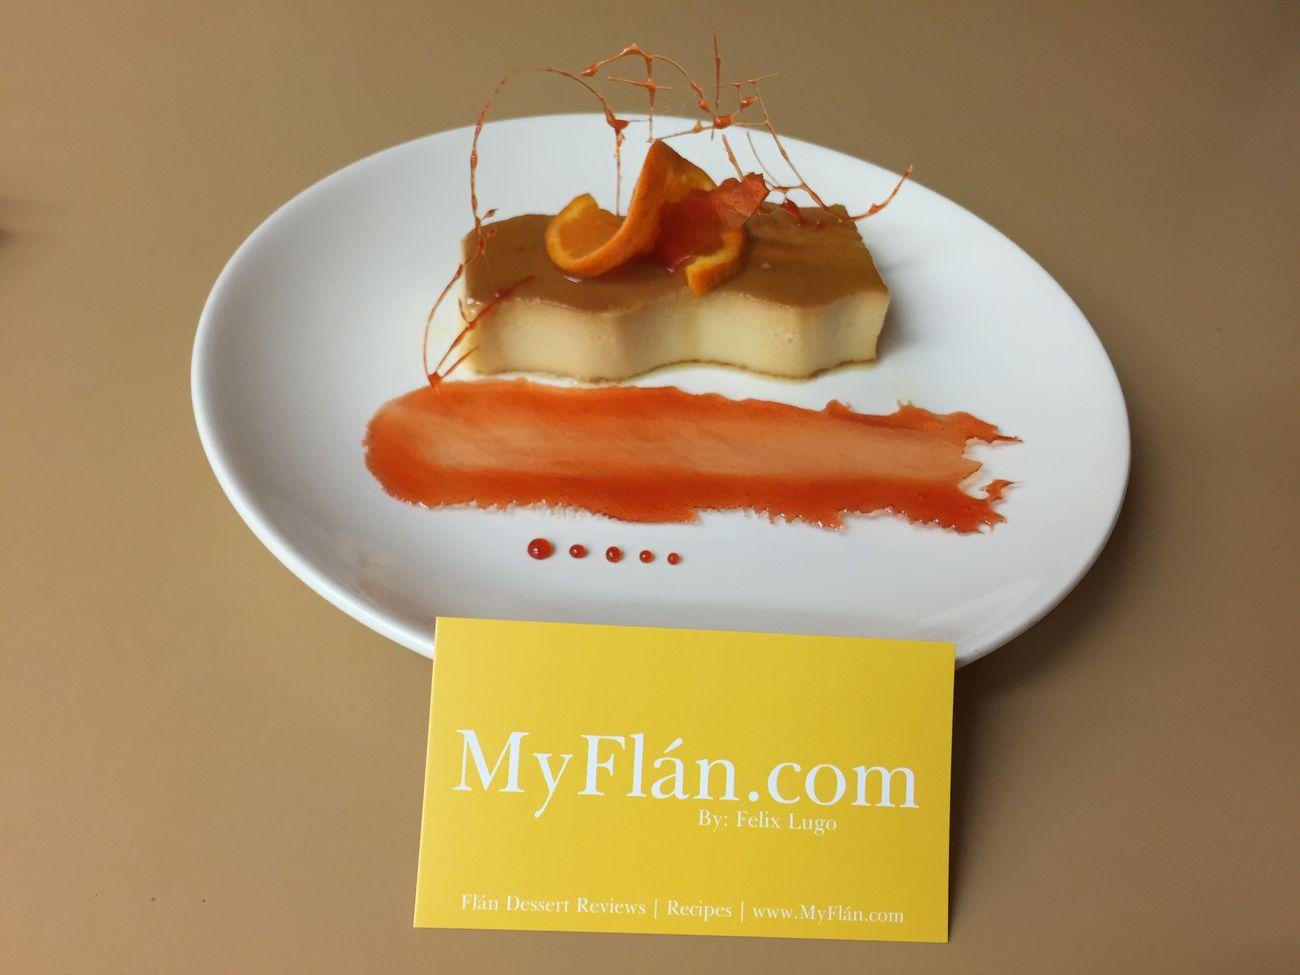 Orangeflan Orange Flan Foodporn Pastry Myflan Pudim Dessert Food Bakery